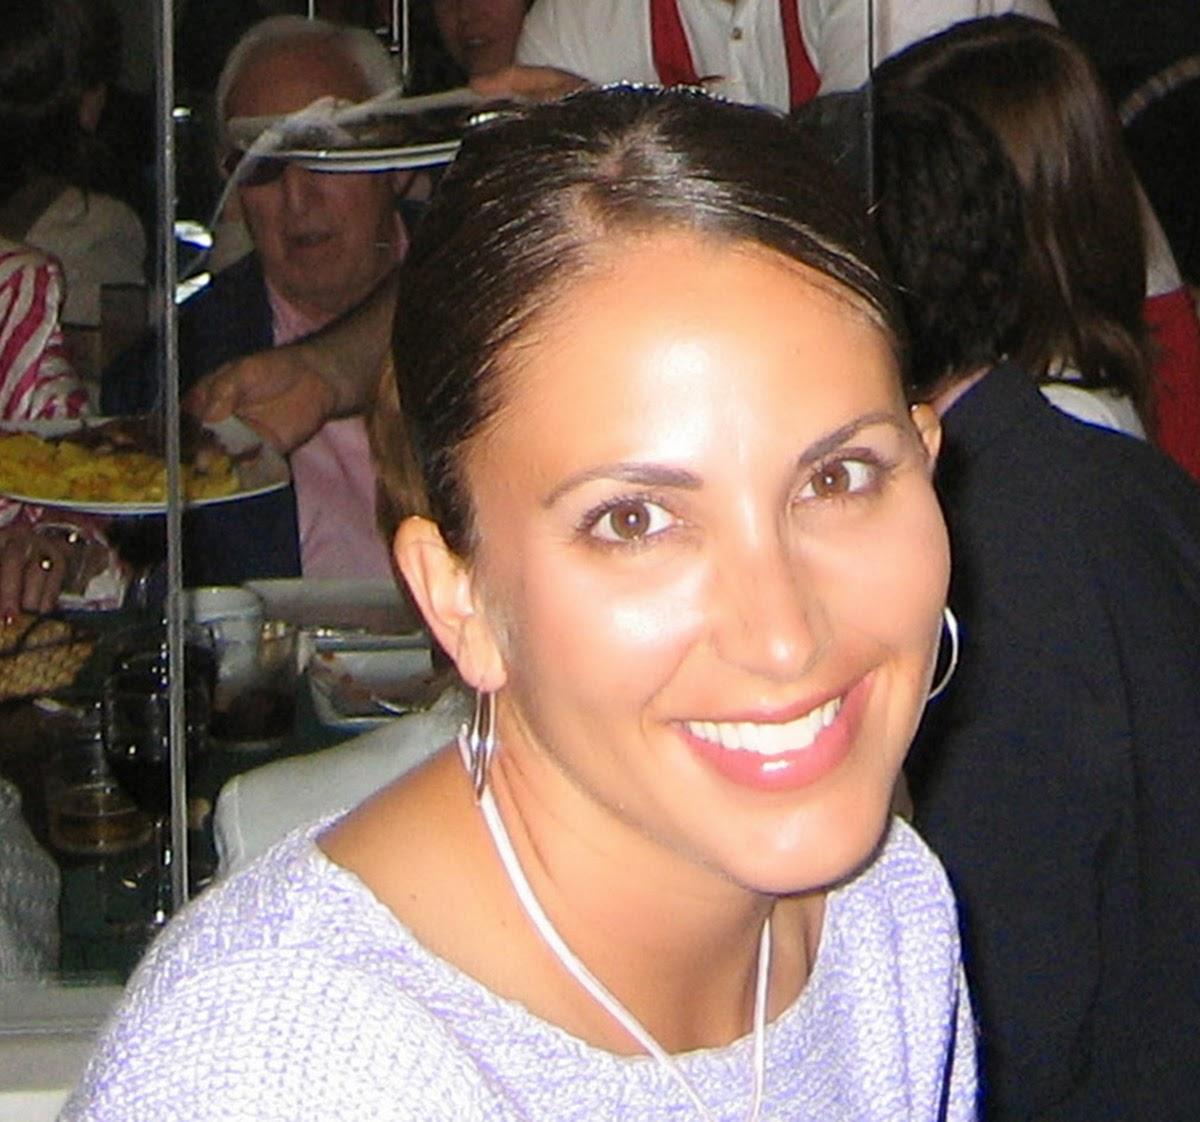 Angela Padron